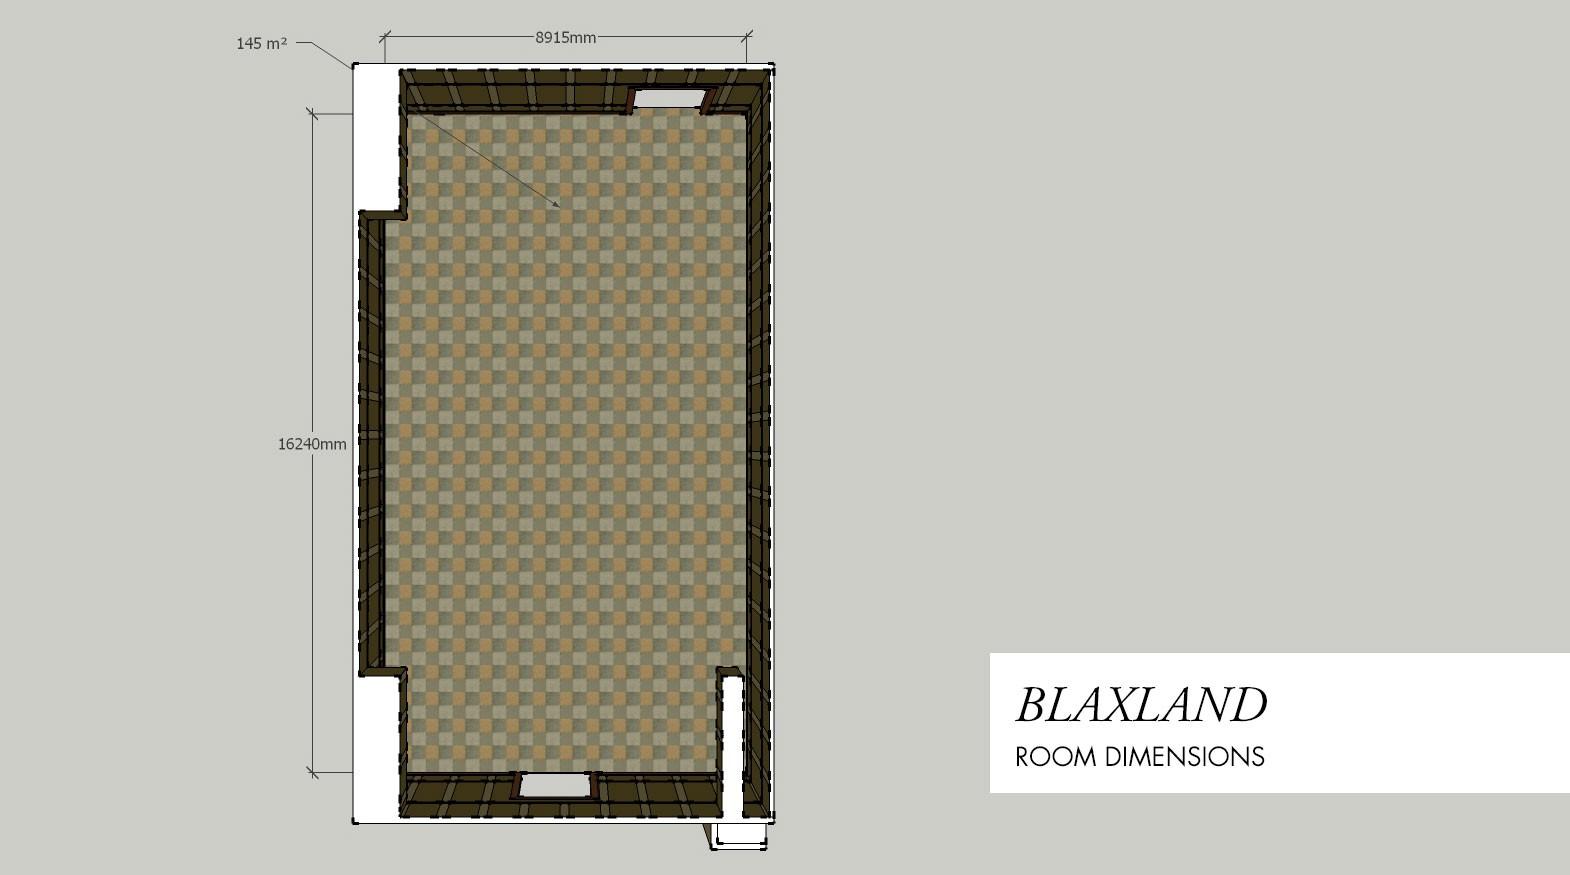 Blaxland-dimensions1.jpg